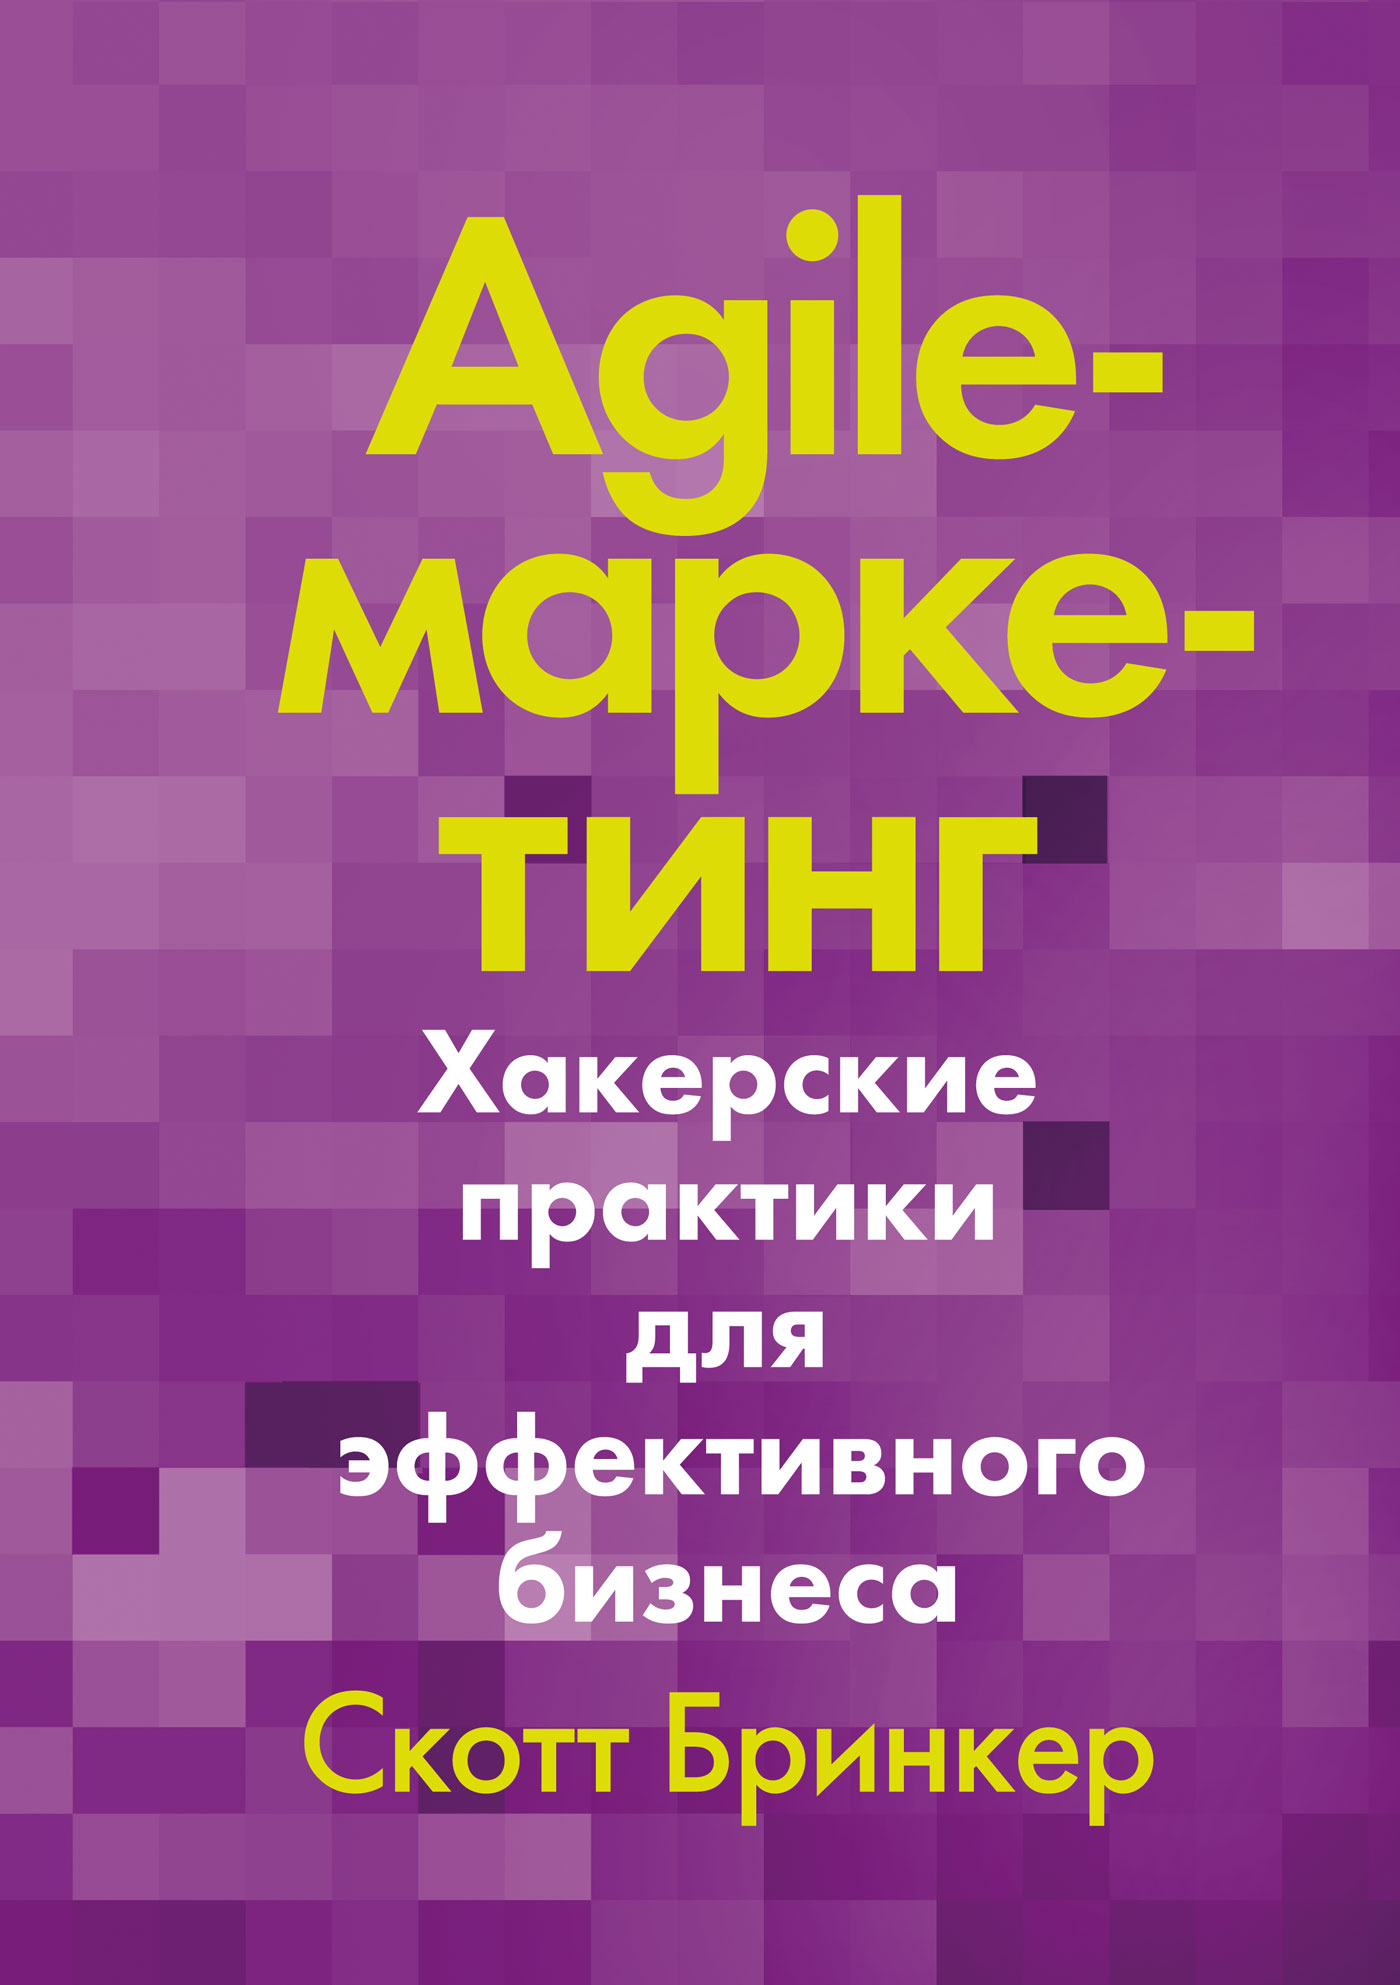 Обложка книги Agile-маркетинг